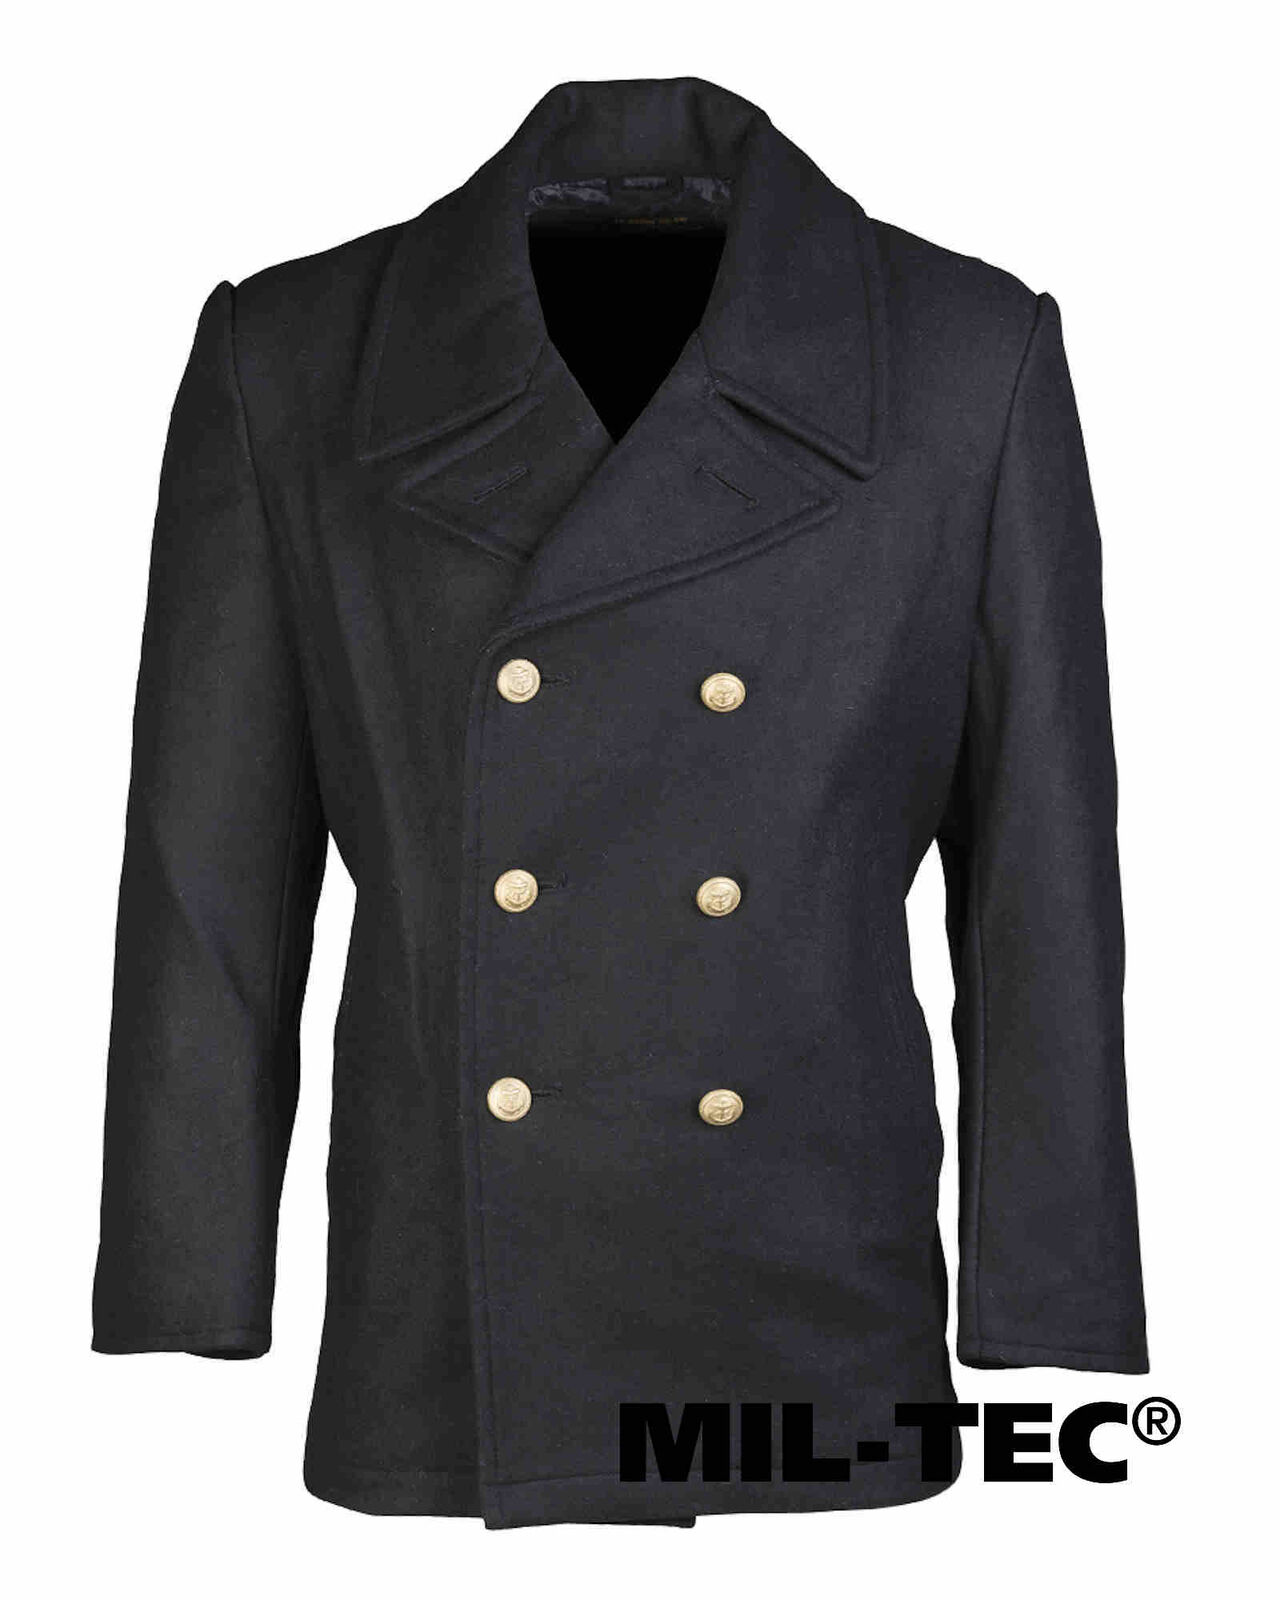 Mil-Tec BW BW BW MARINE COLANI TUCH DK.BLAU KN.Gold Outdoorjacke Jacke 0f7436